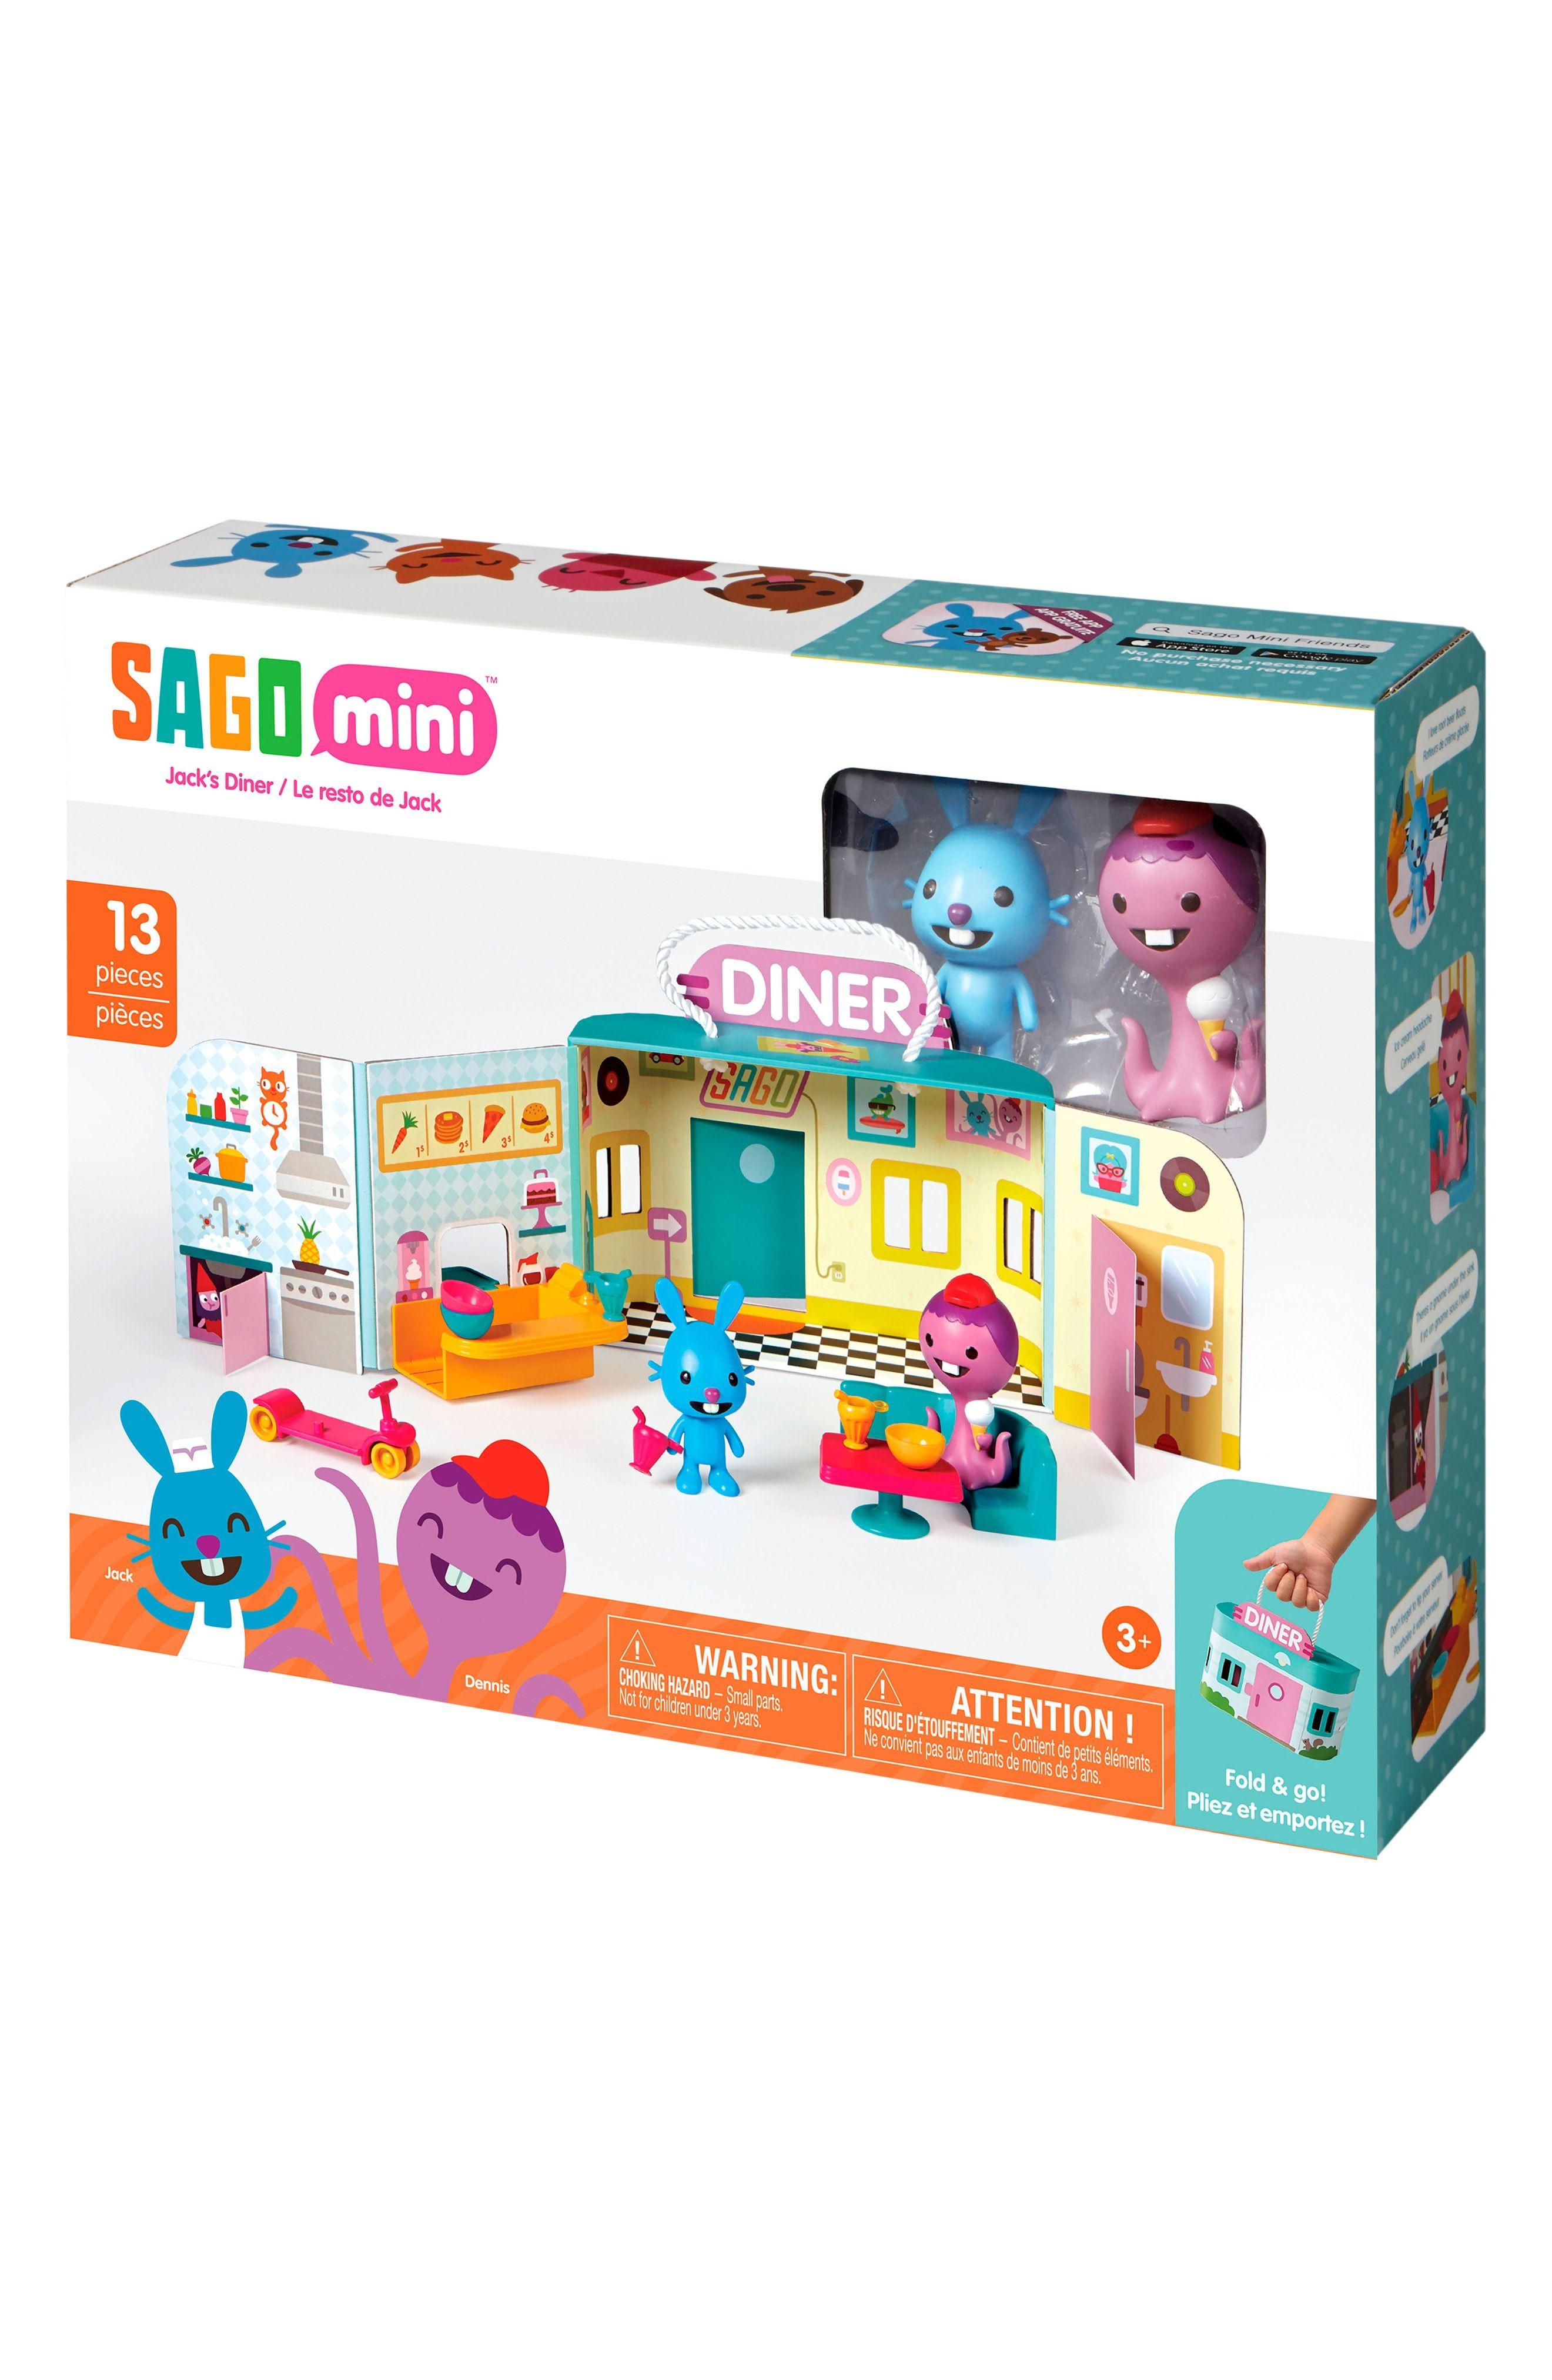 Sago Mini Jack's Diner Portable Play Set Board games for